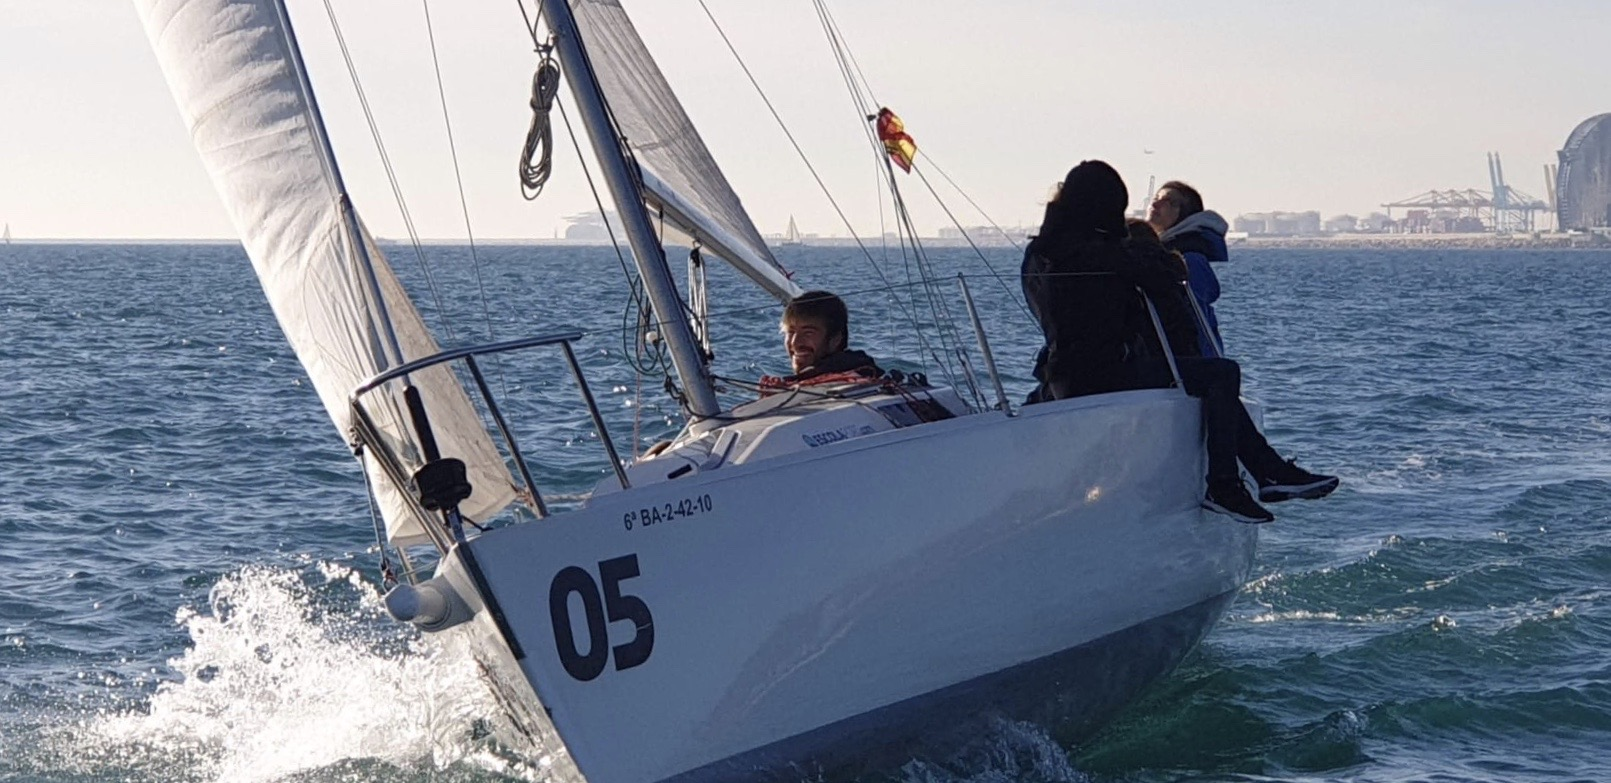 ¿Cómo aprender a navegar a vela?